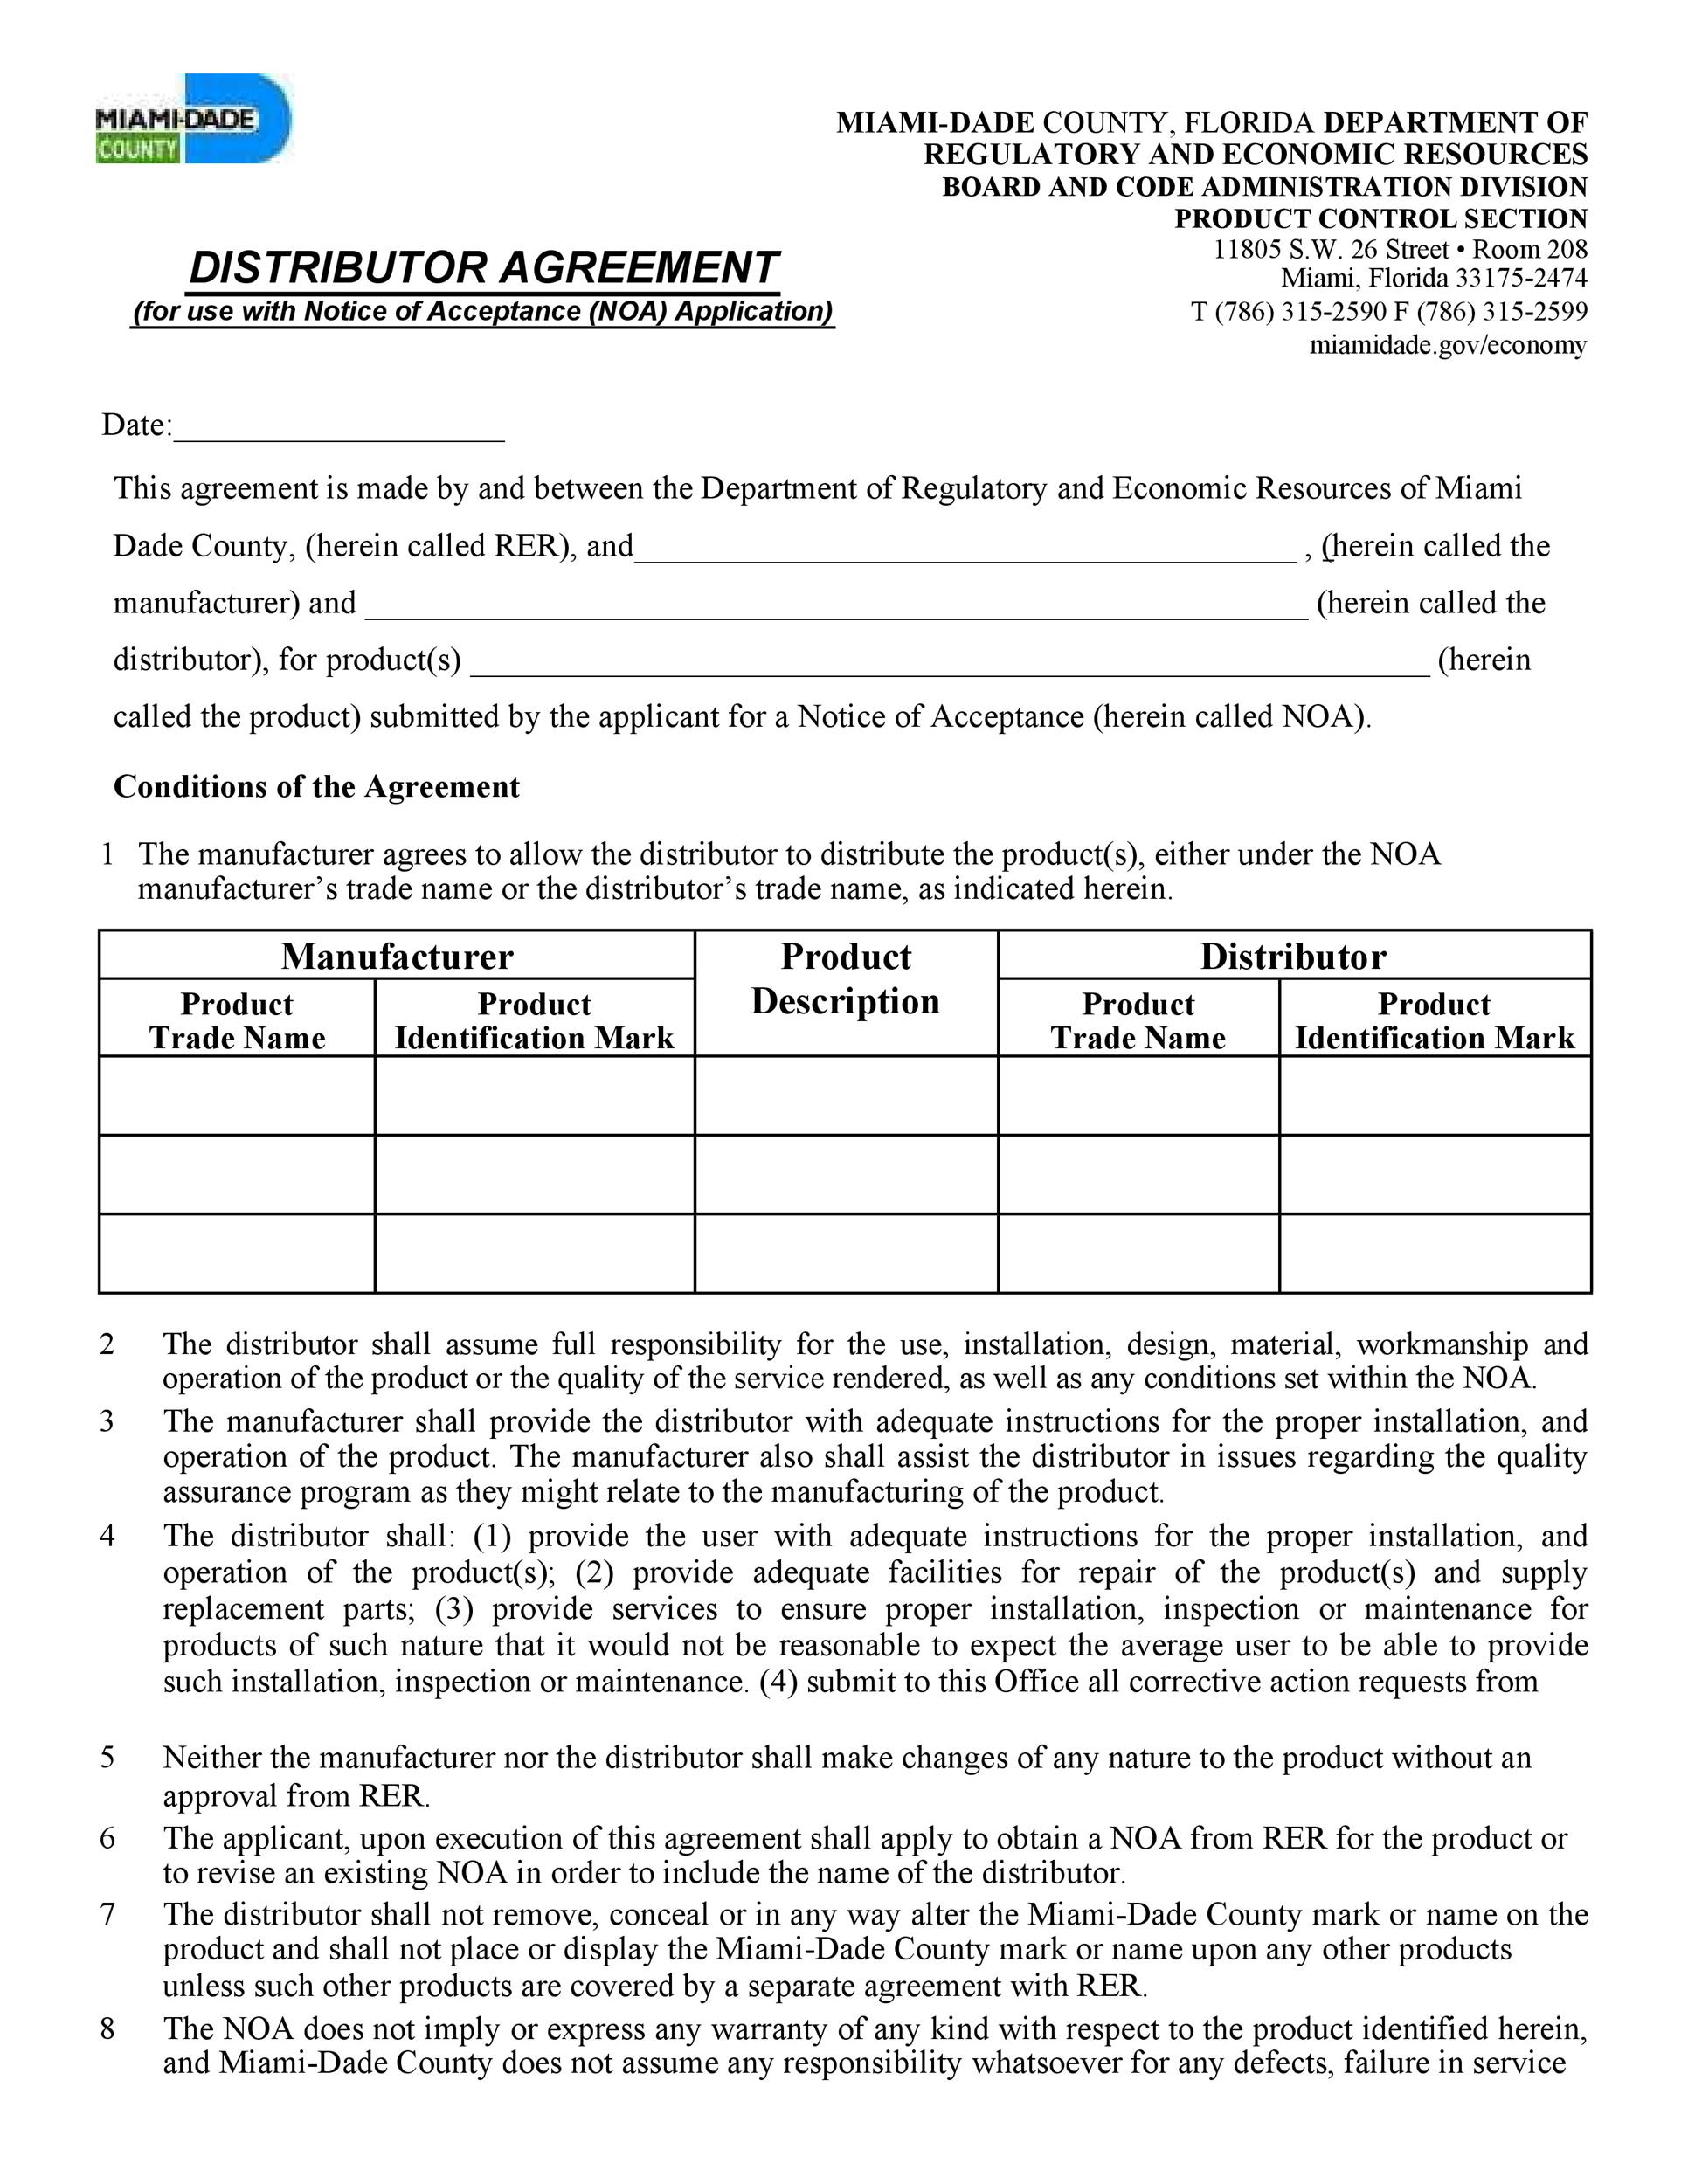 Free distribution agreement 25